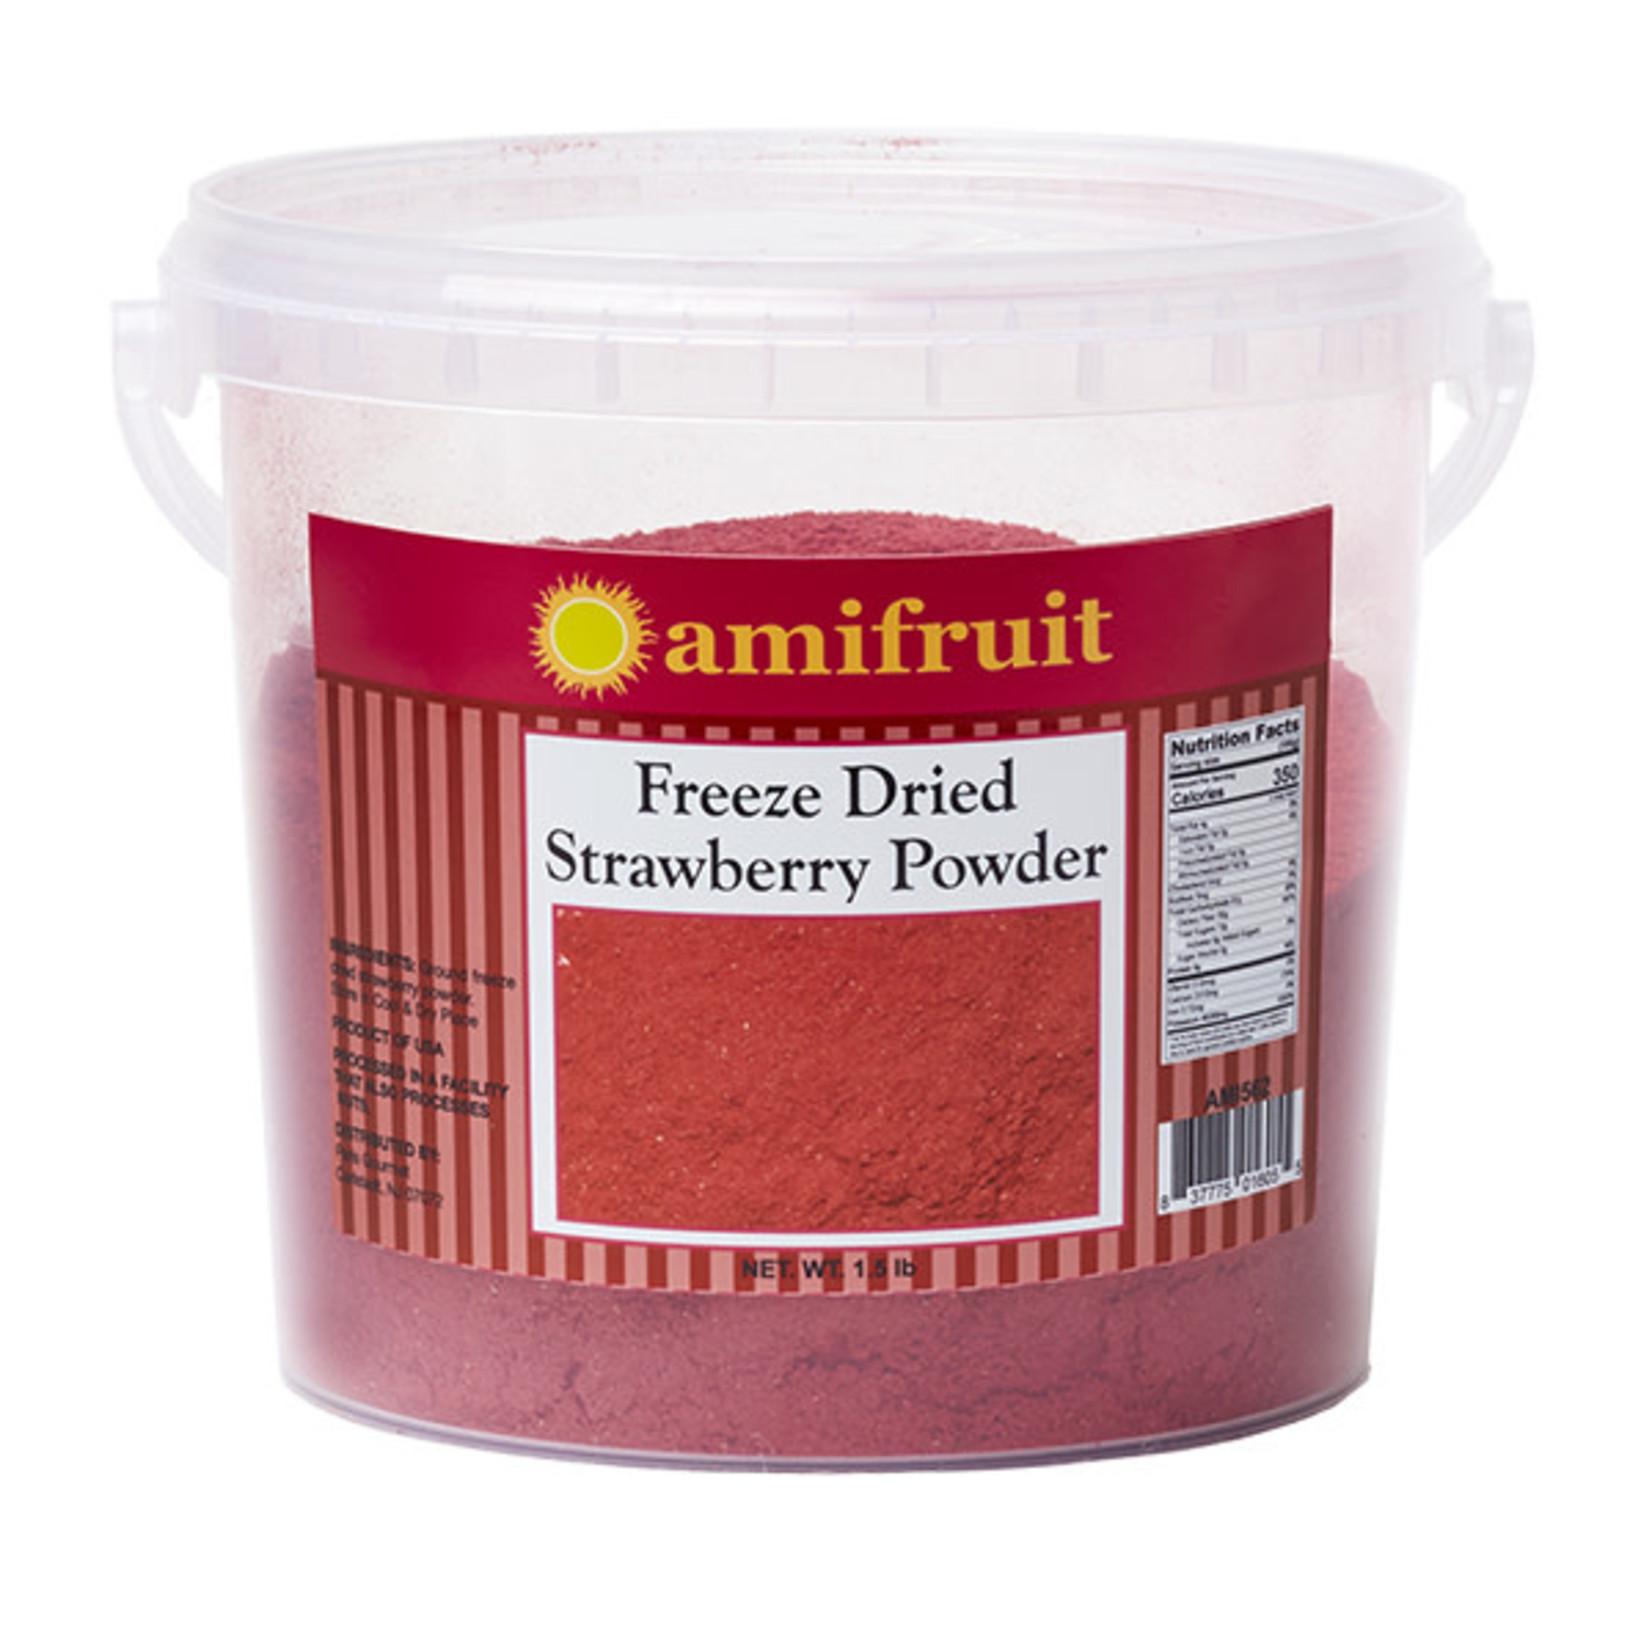 Amifruit Amifruit - Freeze dried Strawberry Powder - 1.5lb, AMI562